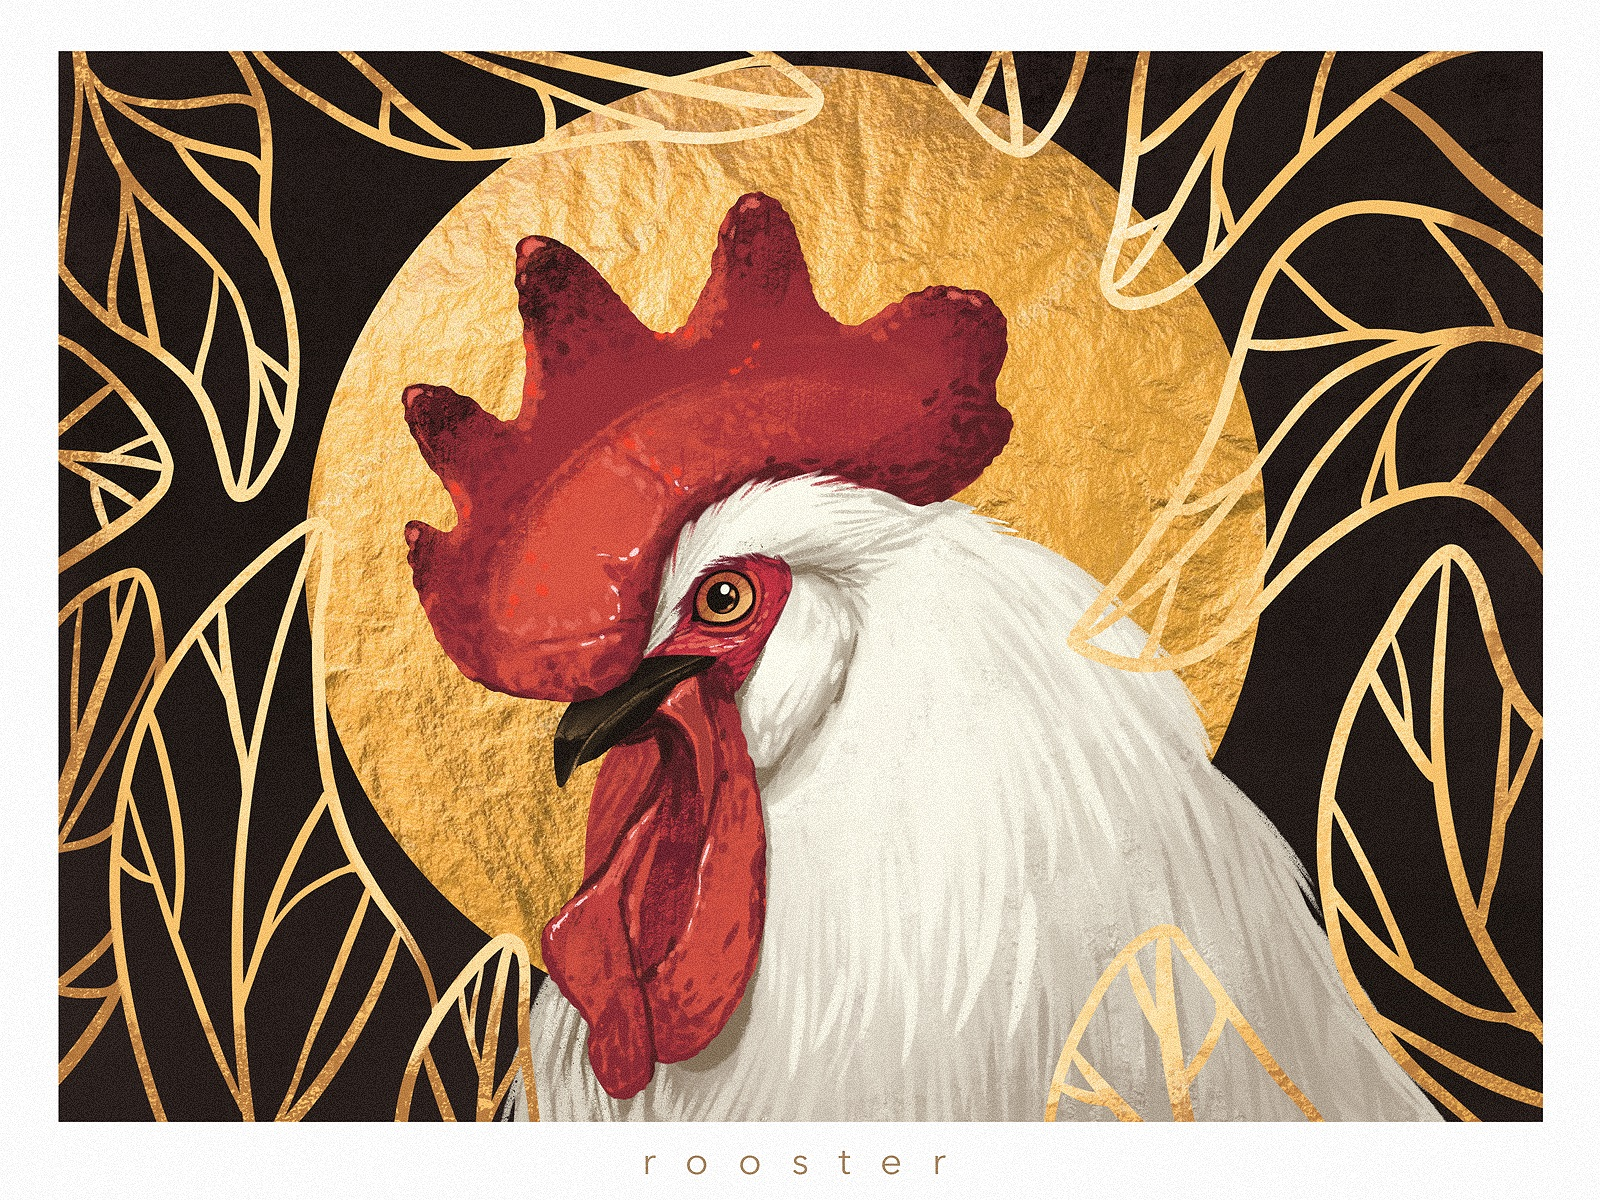 animal rooster portrait illustration tubikarts